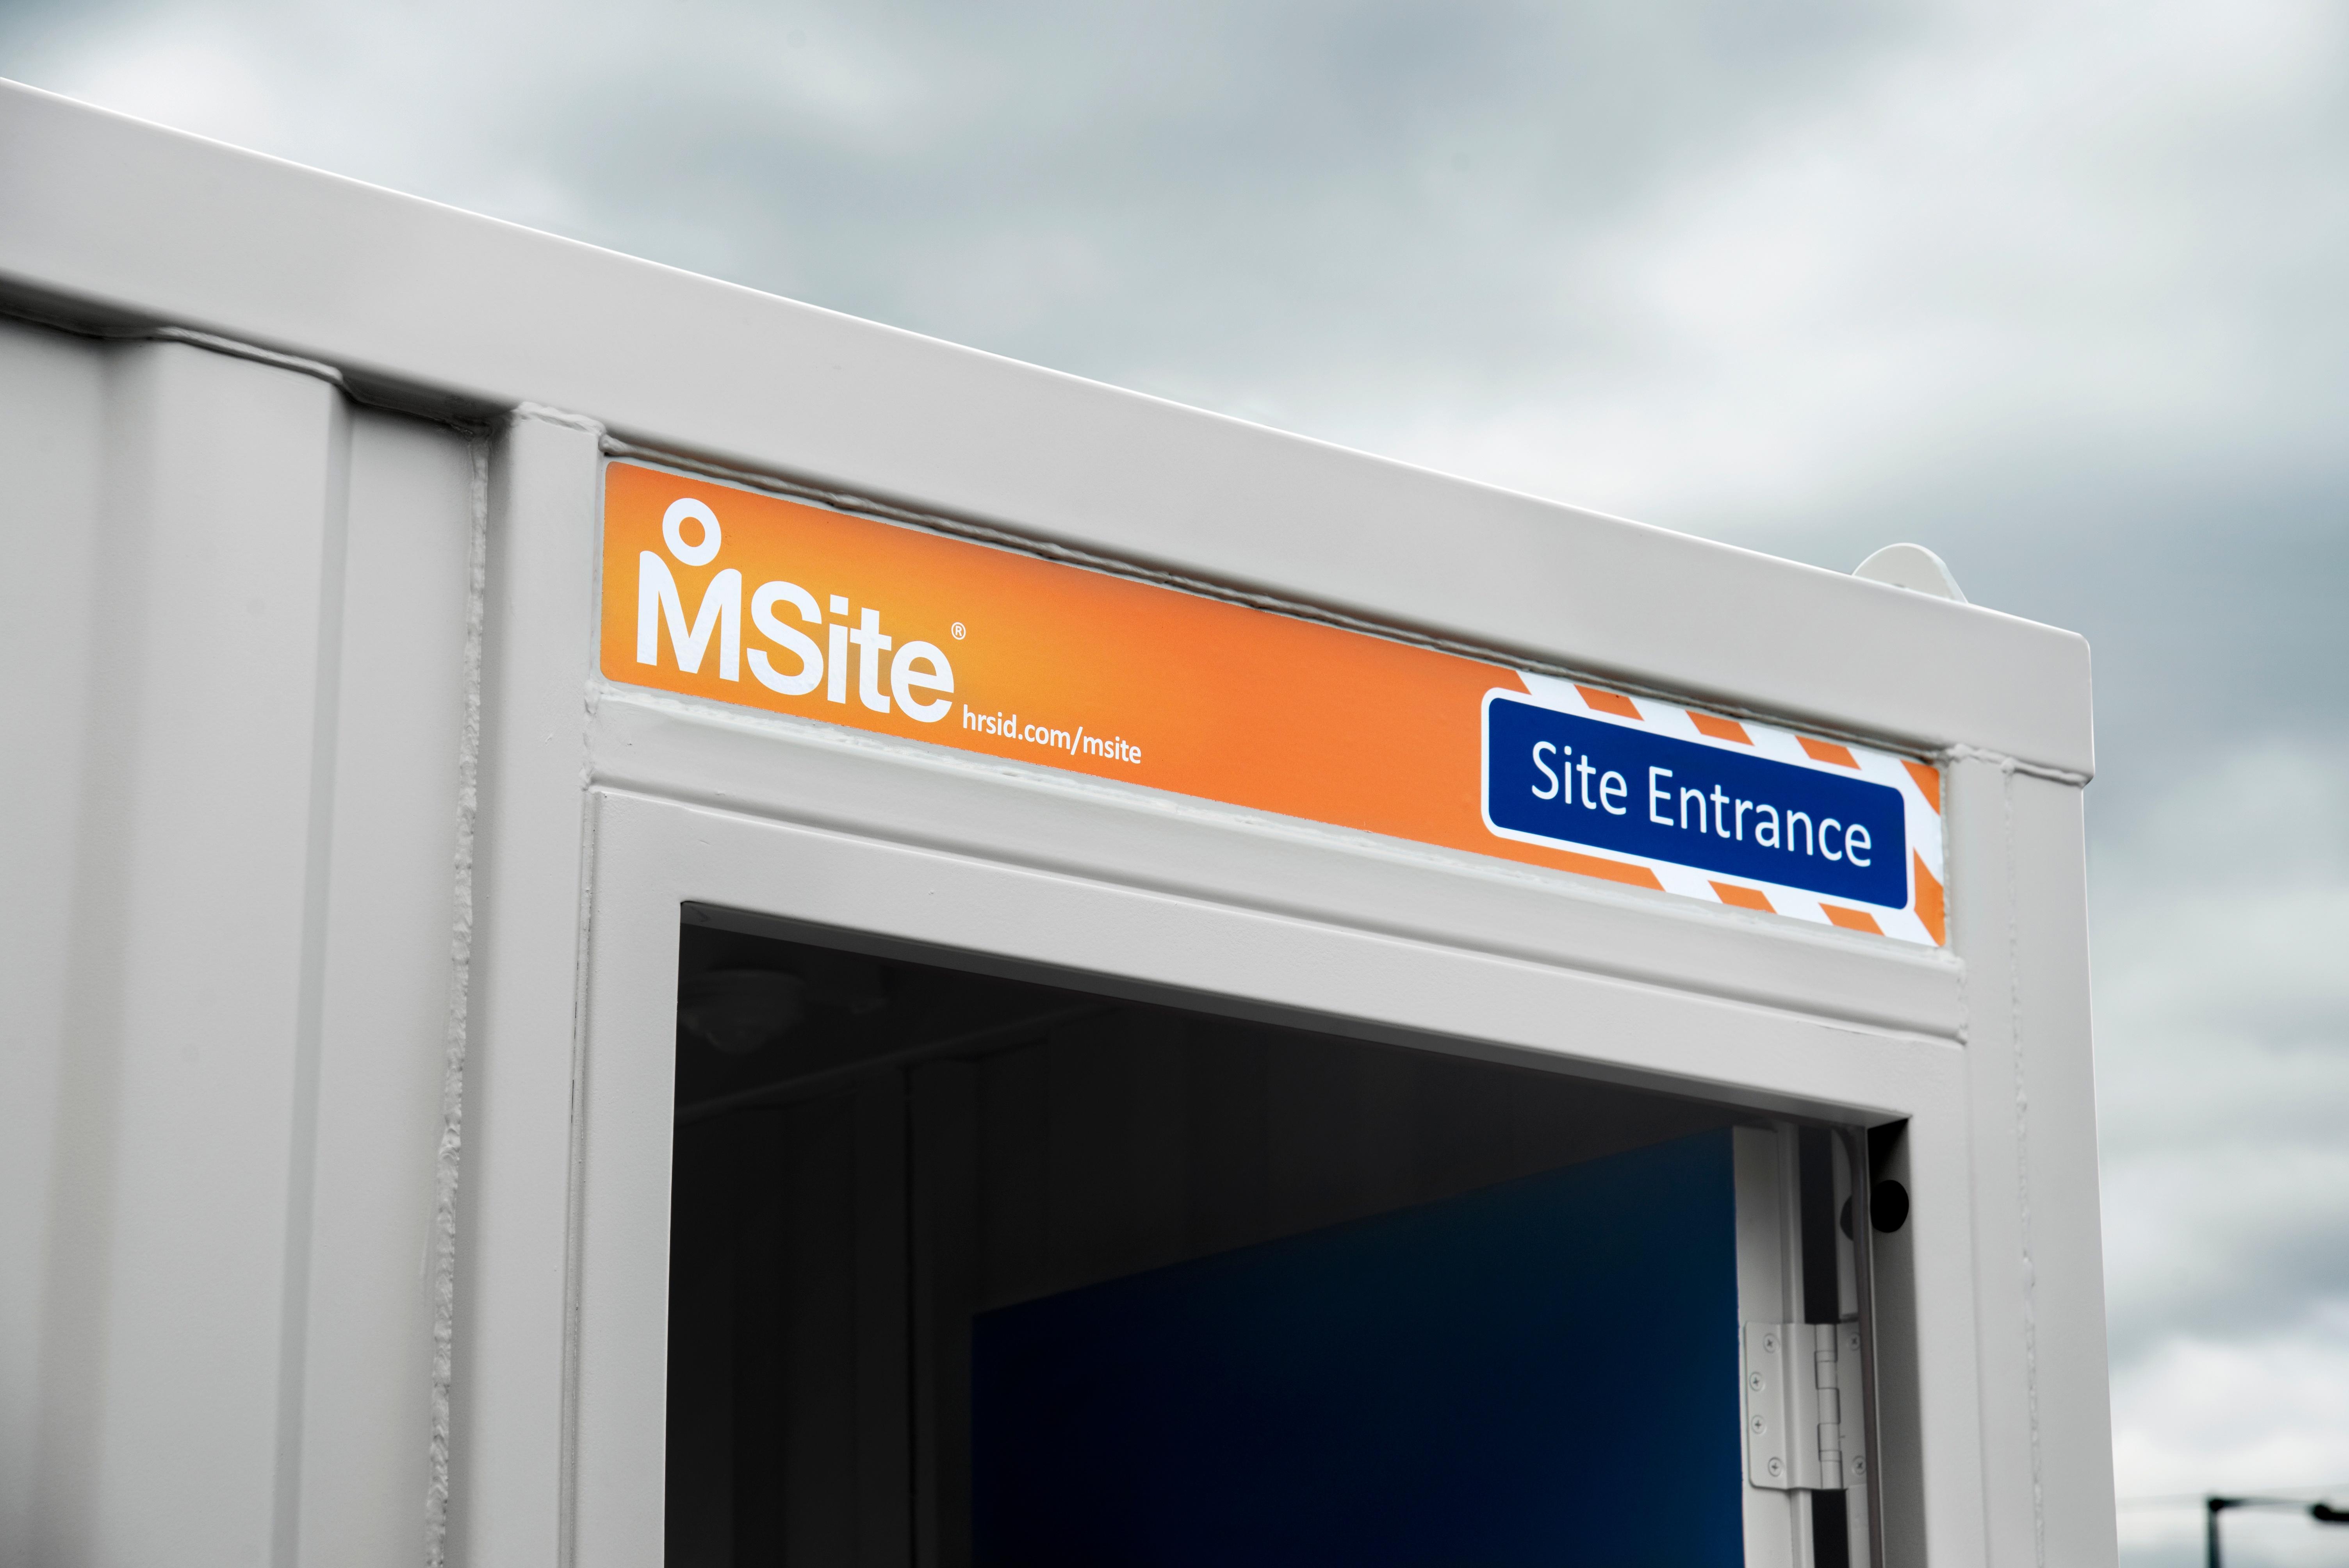 MSite-access-control-turnstile-pod